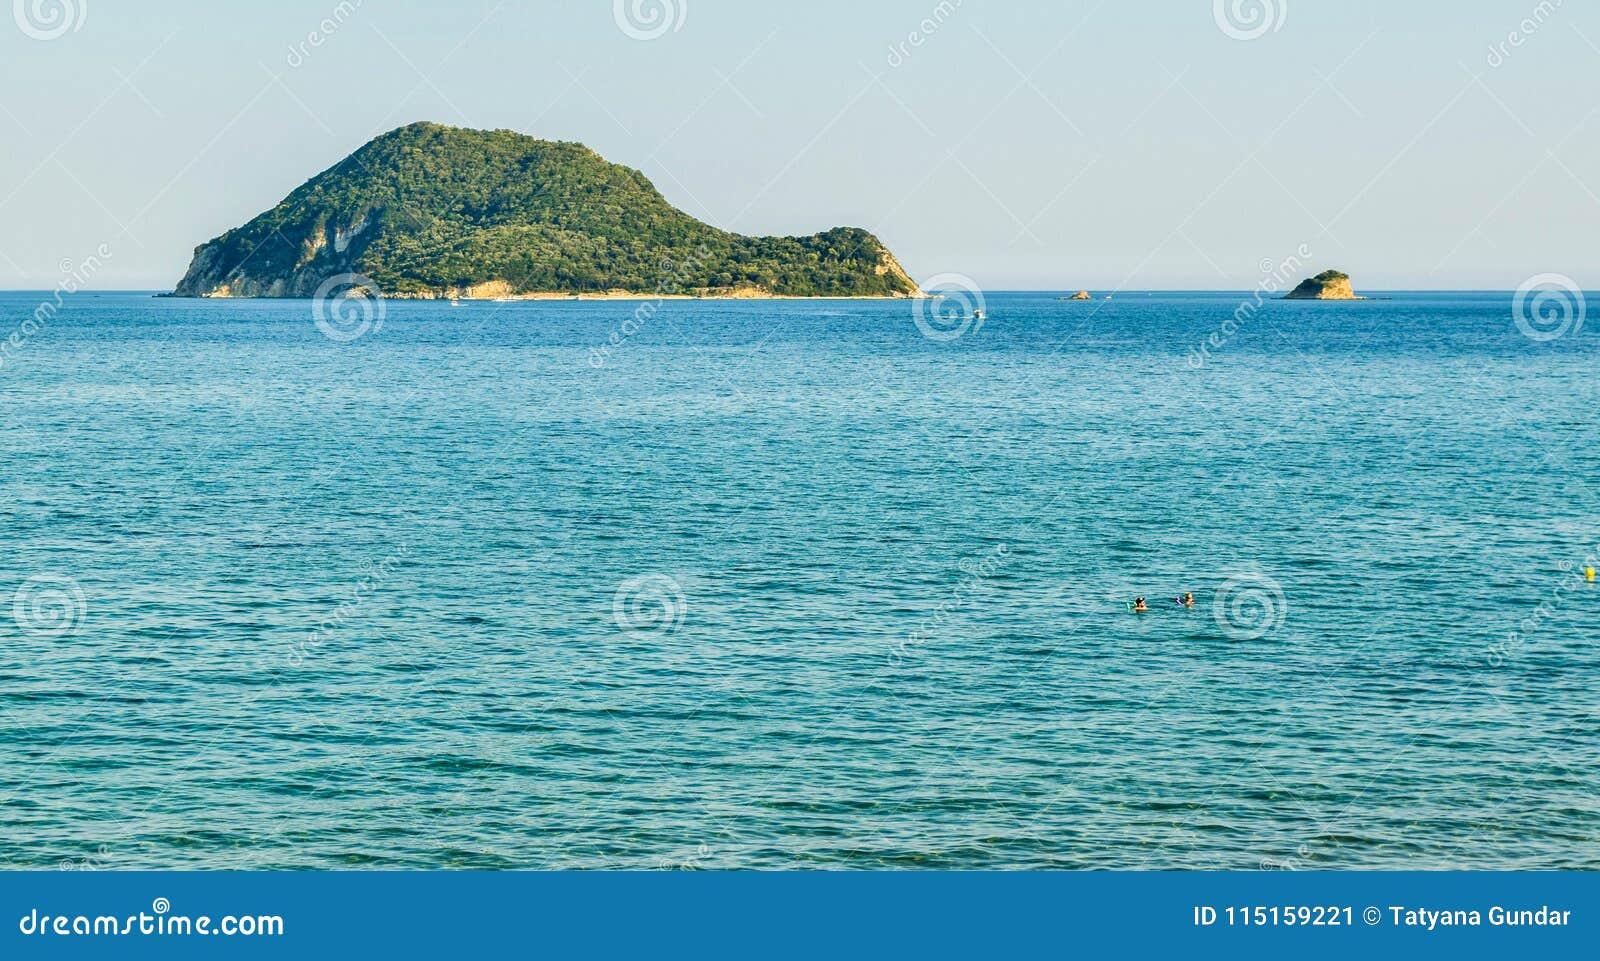 Marathonisi island, Greece.